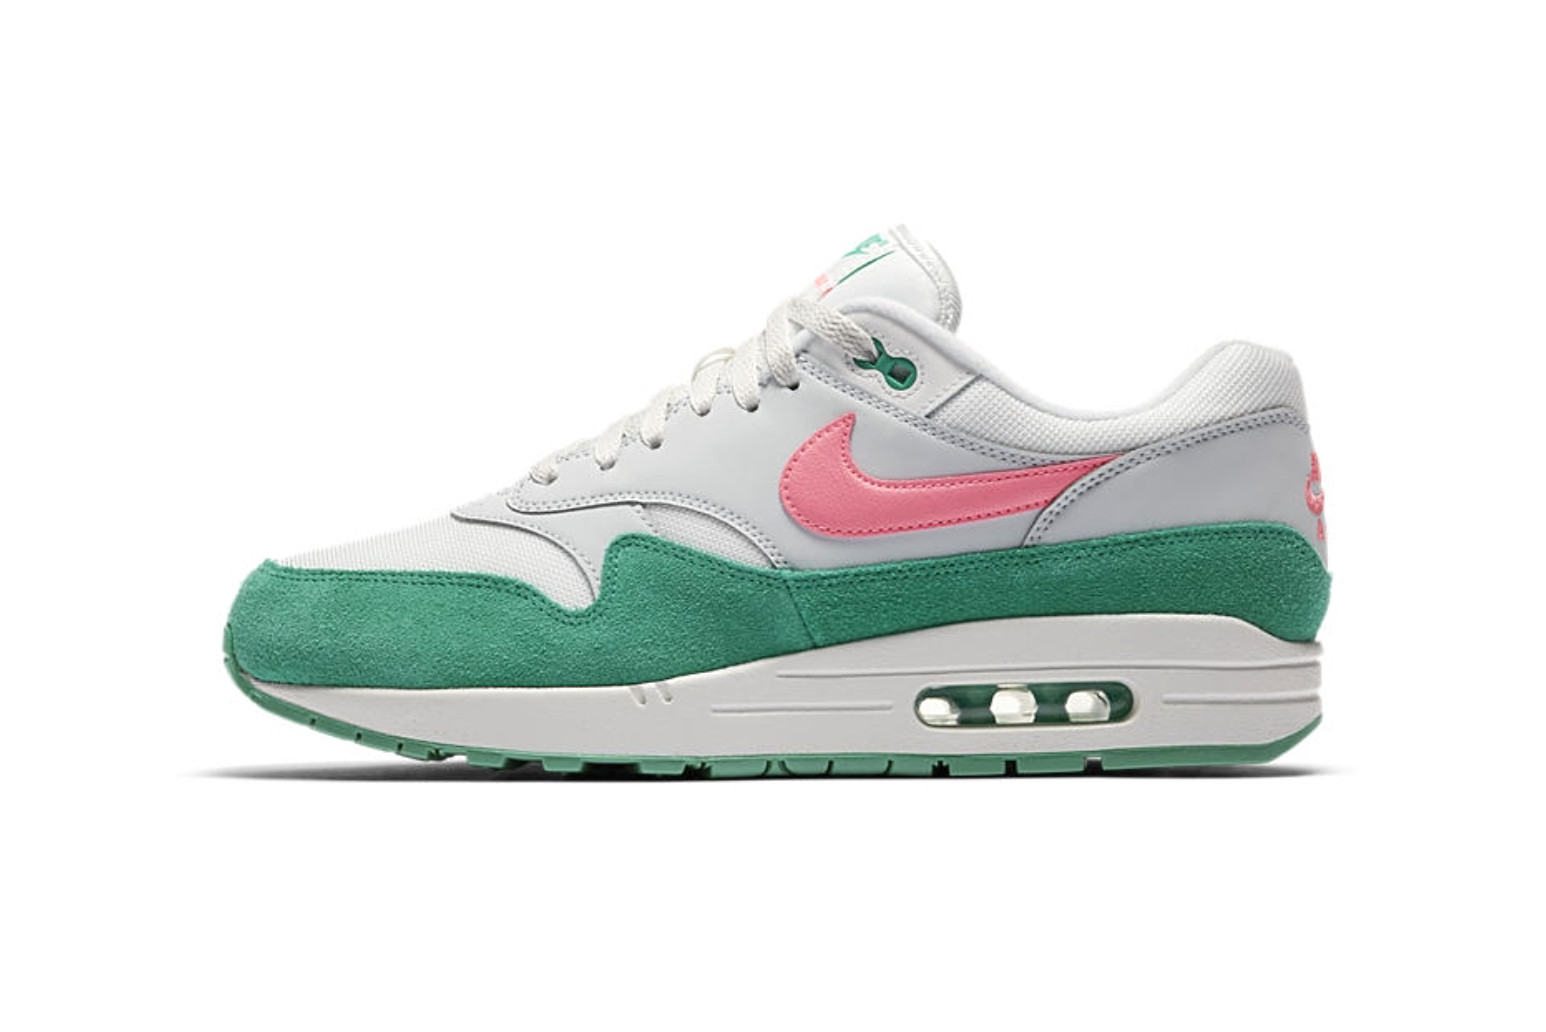 lowest price 3ecbe 24491 Pastel Nike Air Max 1